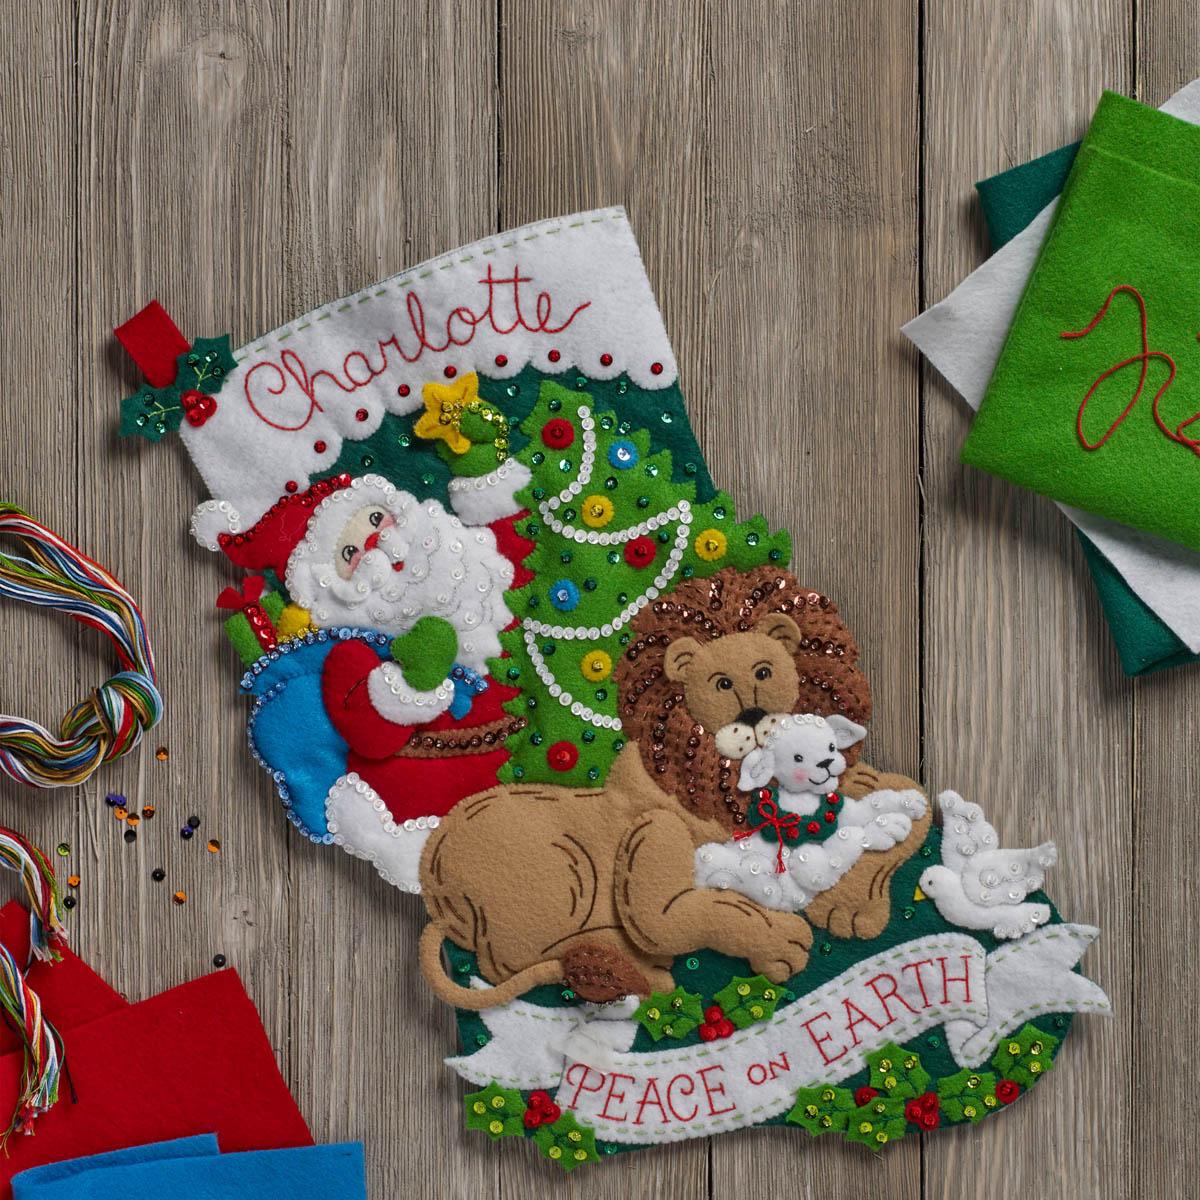 Bucilla ® Seasonal - Felt - Stocking Kits - Peace On Earth - 86665